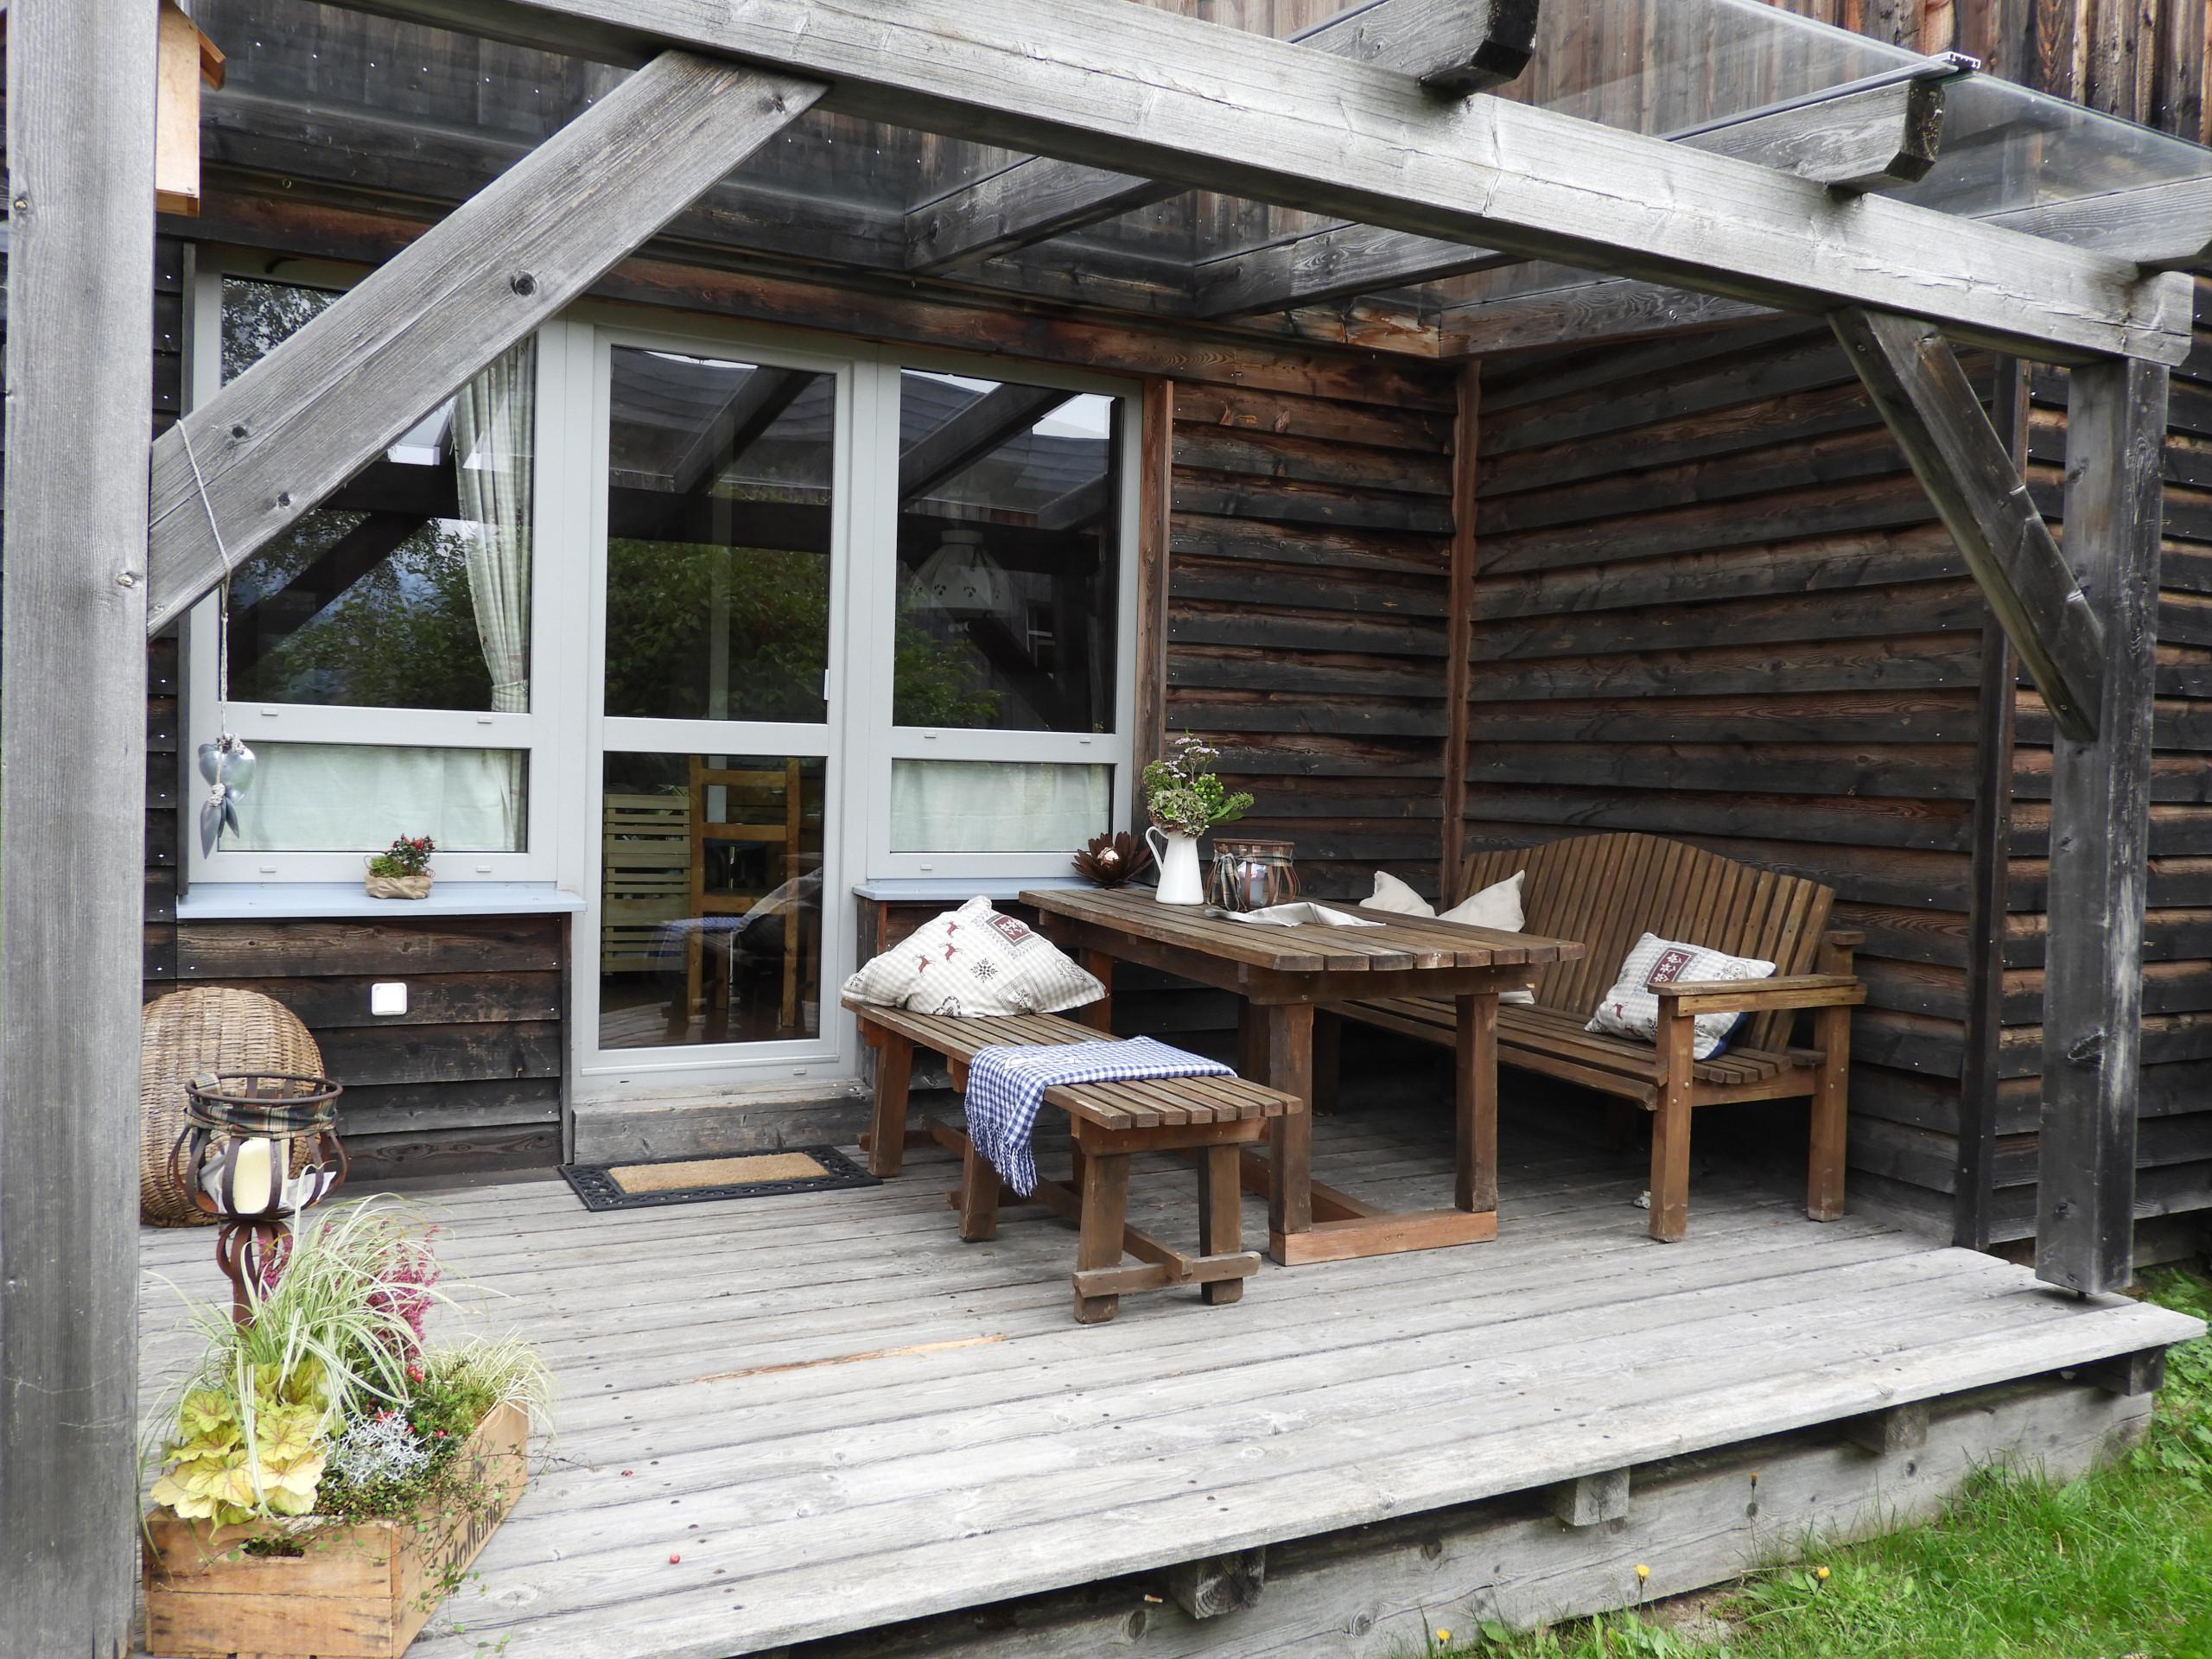 ferienh user hohentauern haus ulla 21. Black Bedroom Furniture Sets. Home Design Ideas